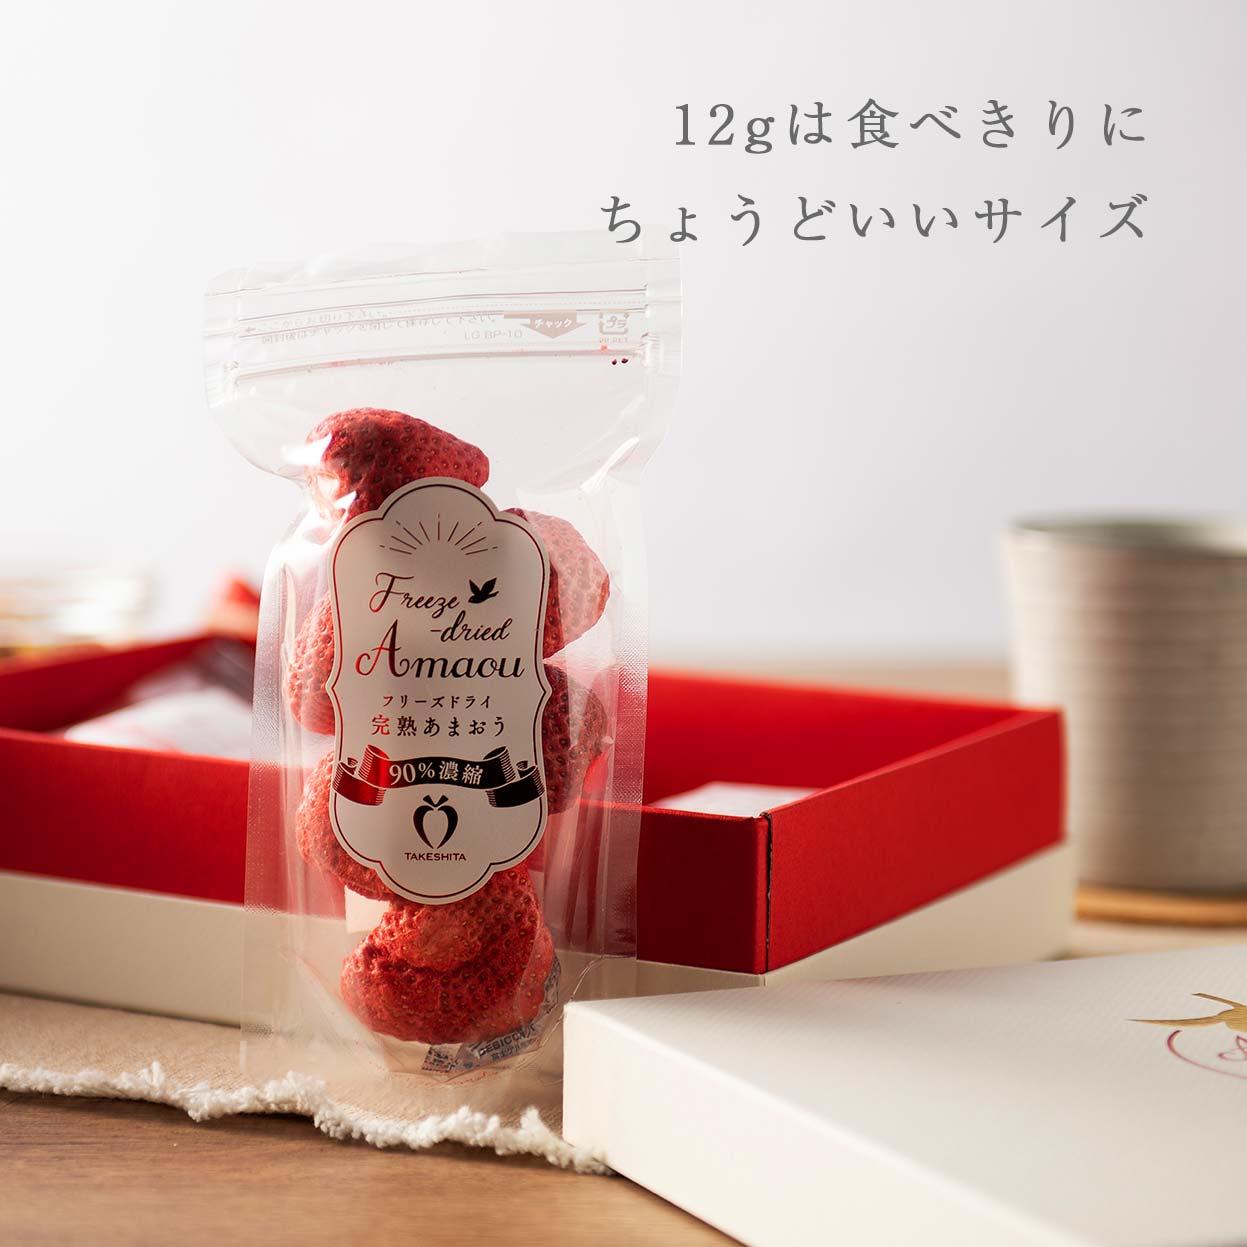 VIPボックス赤 フリーズドライあまおうセット(12g×4袋)